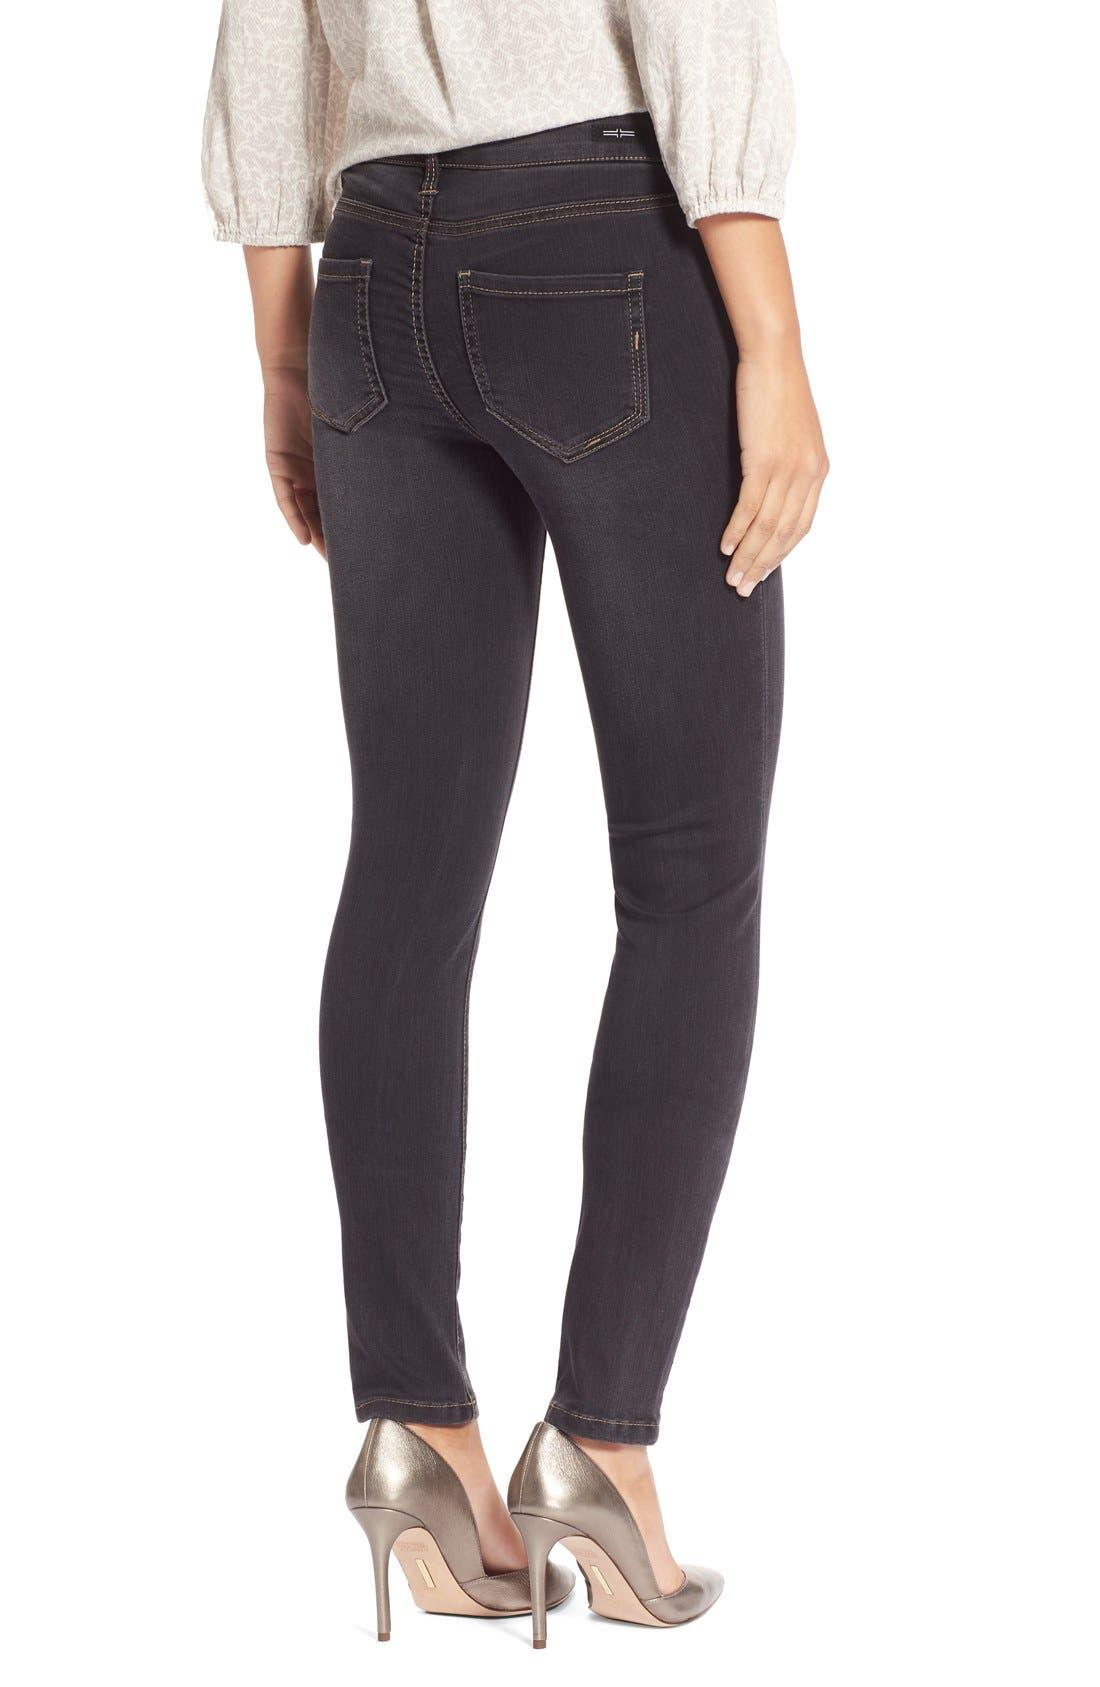 Abby StretchSkinny Jeans,                             Alternate thumbnail 2, color,                             Sulphur